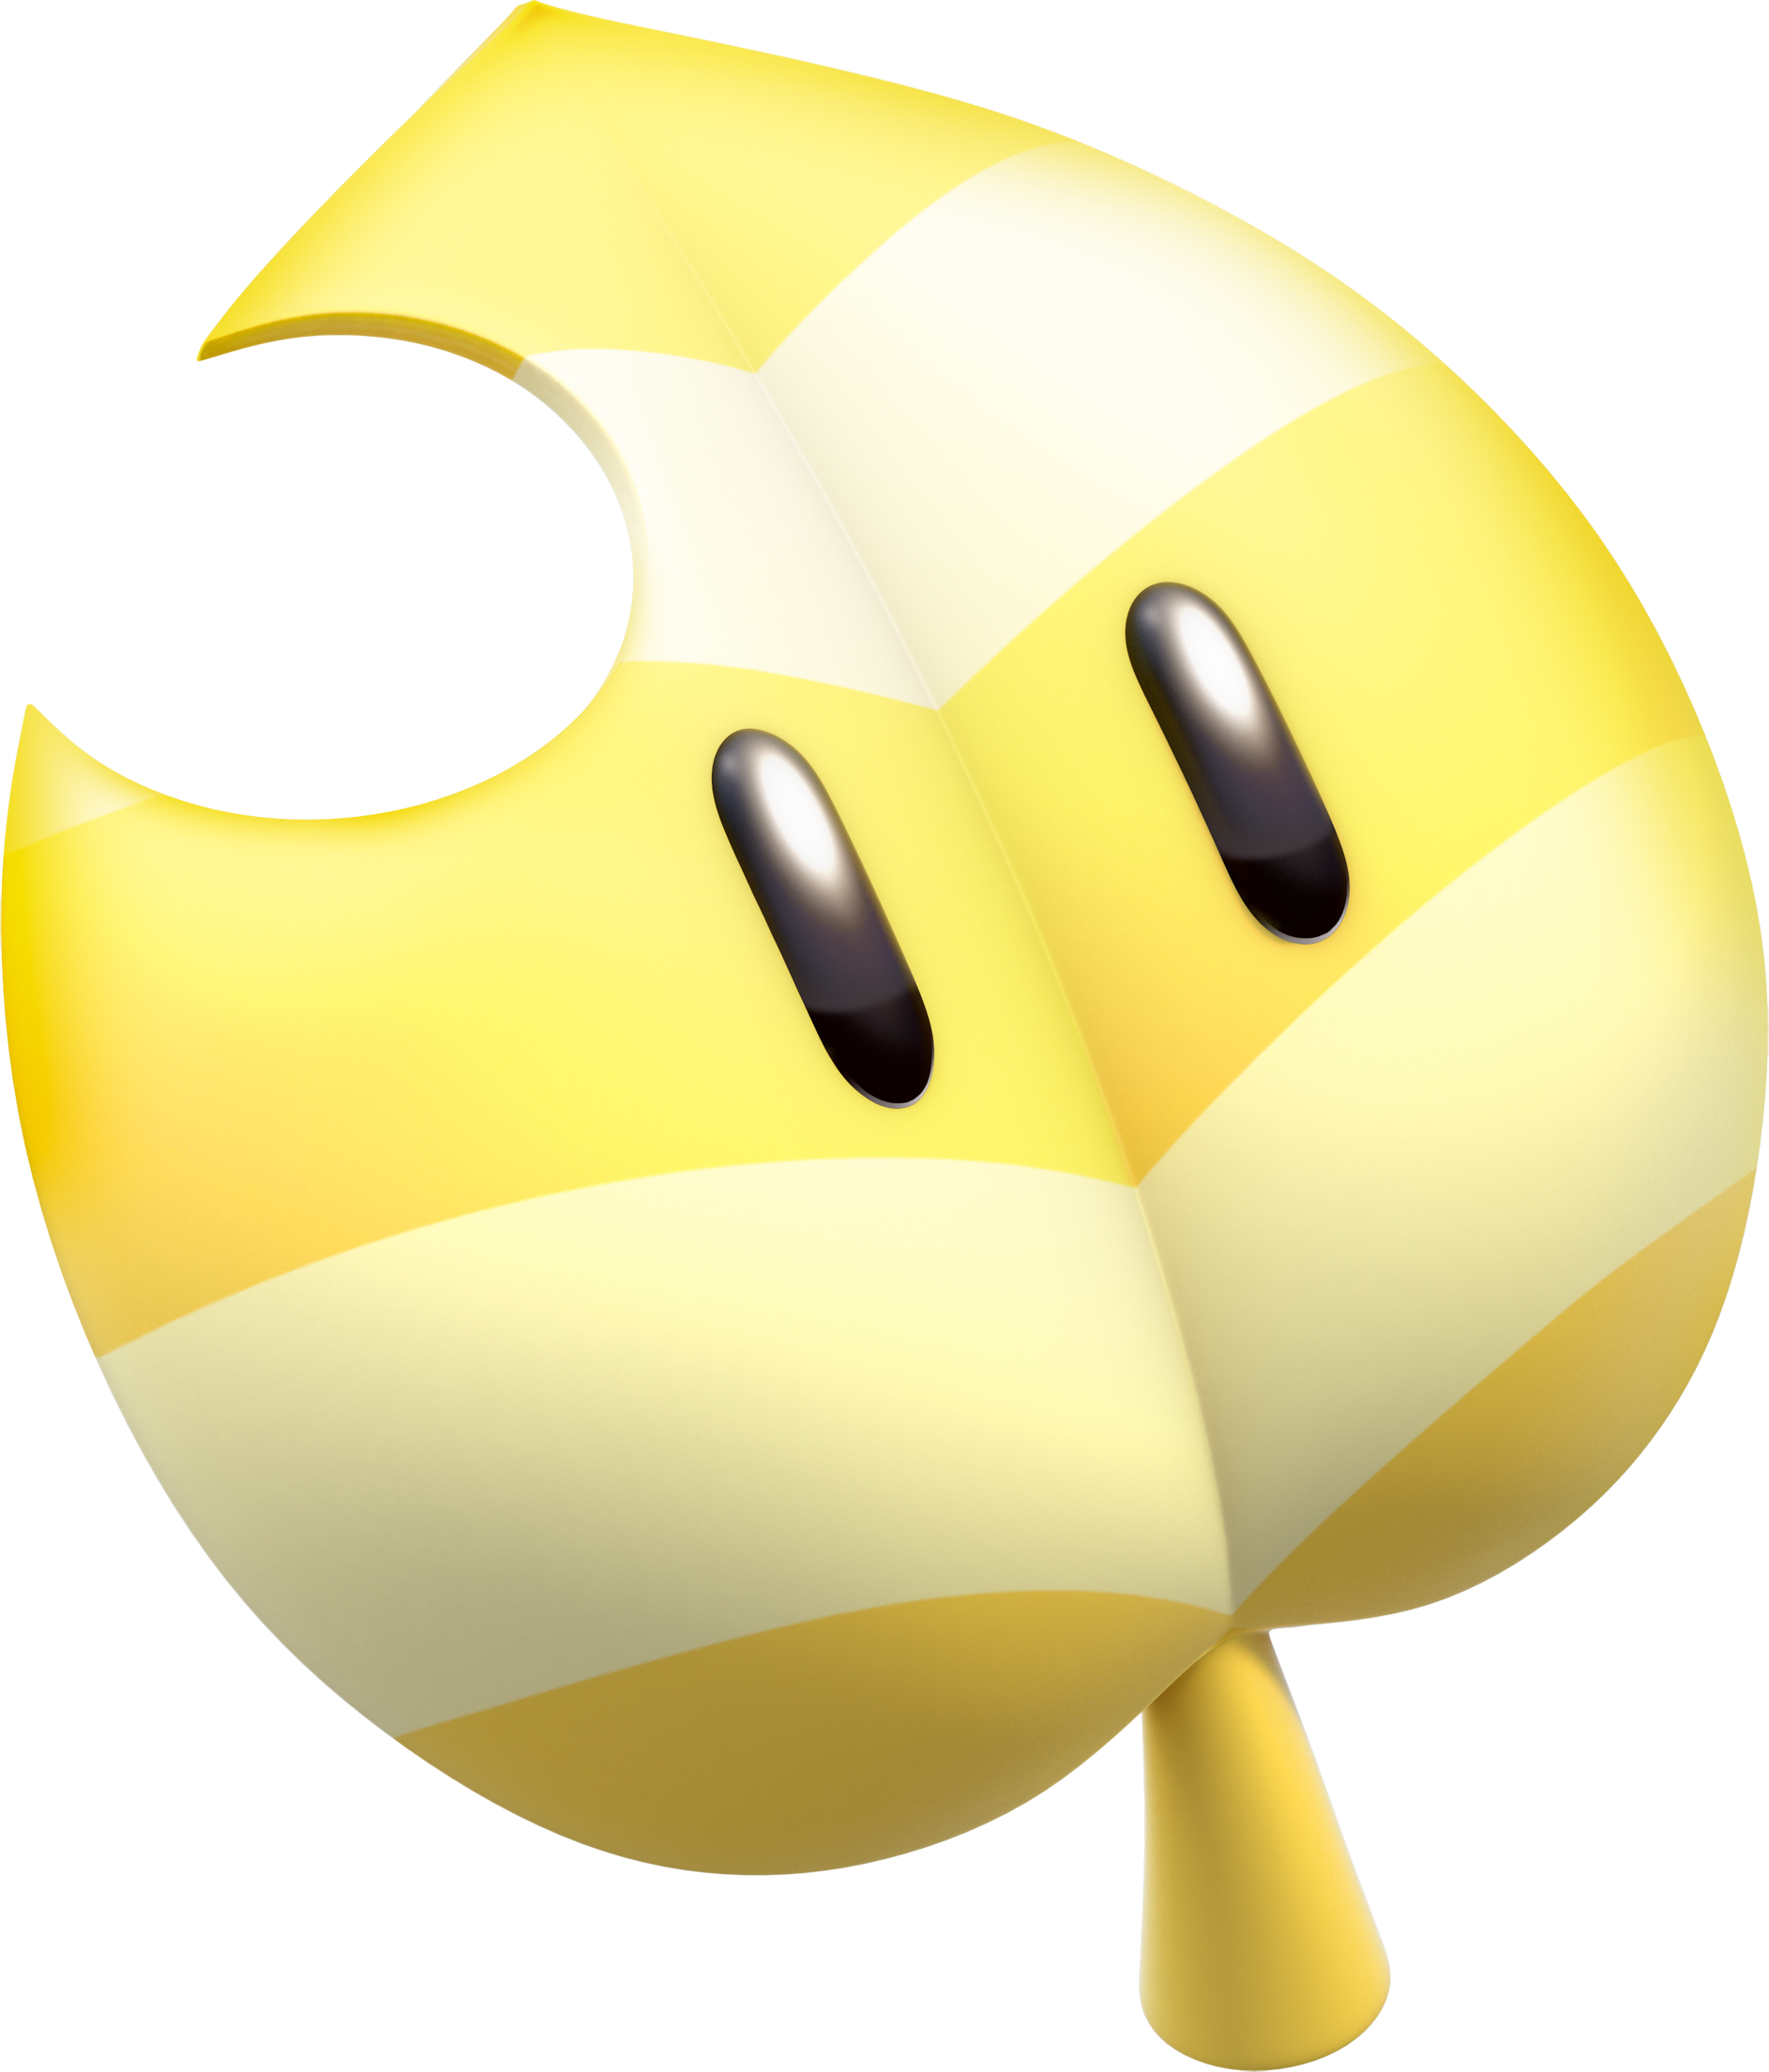 Mario clipart smiling star 3D Boy: Resolution Mario World